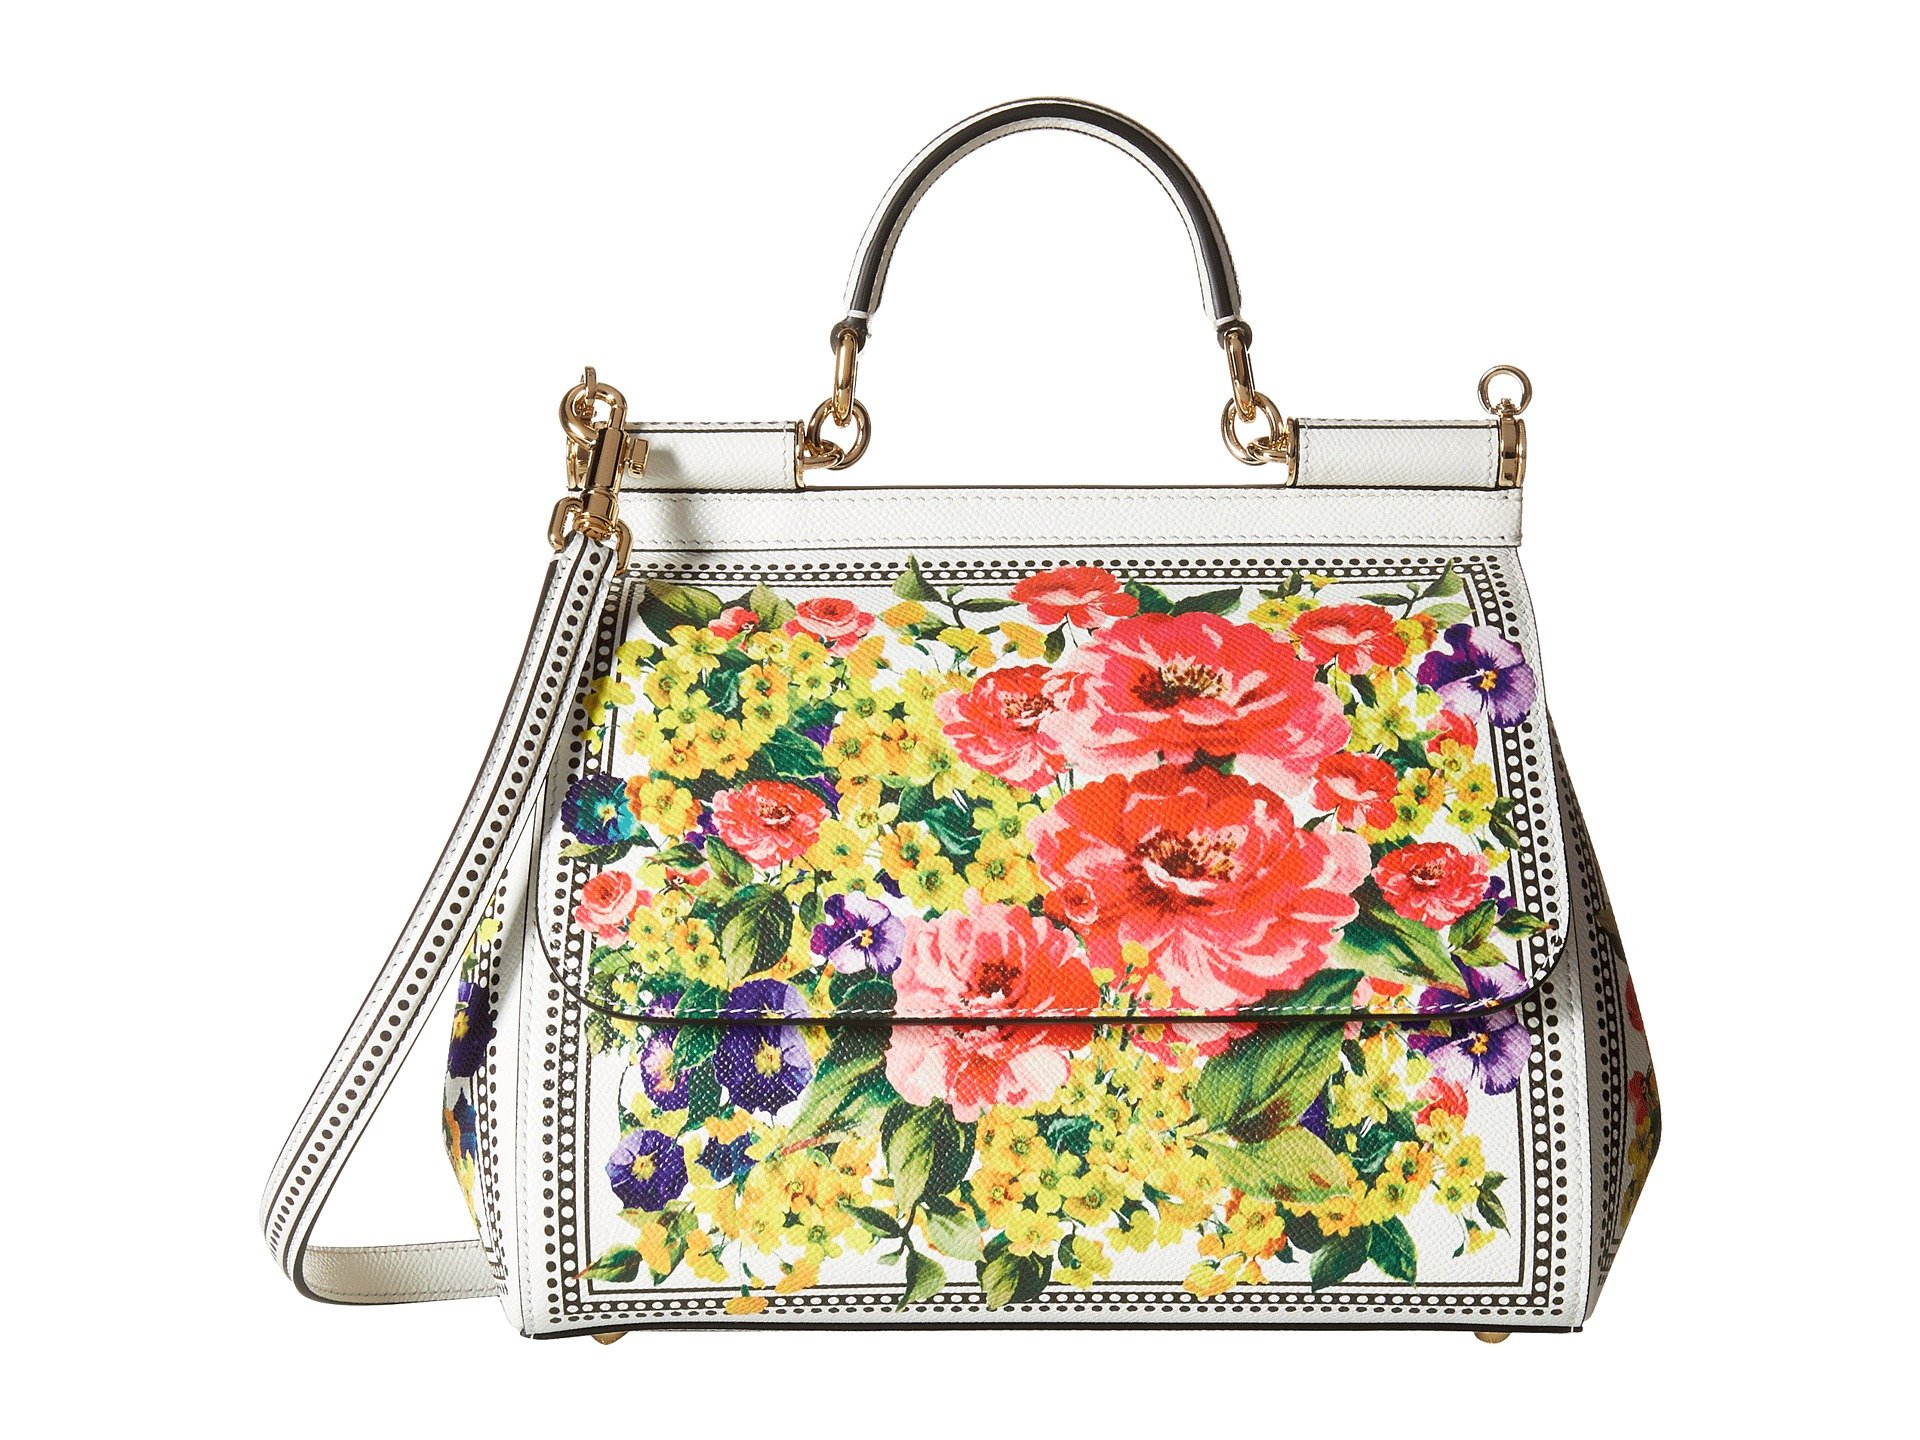 Bolso tipo Satchel para Mujer Dolce and Gabbana Floral Printed Sicily Bag  + Dolce & Gabbana en VeoyCompro.net